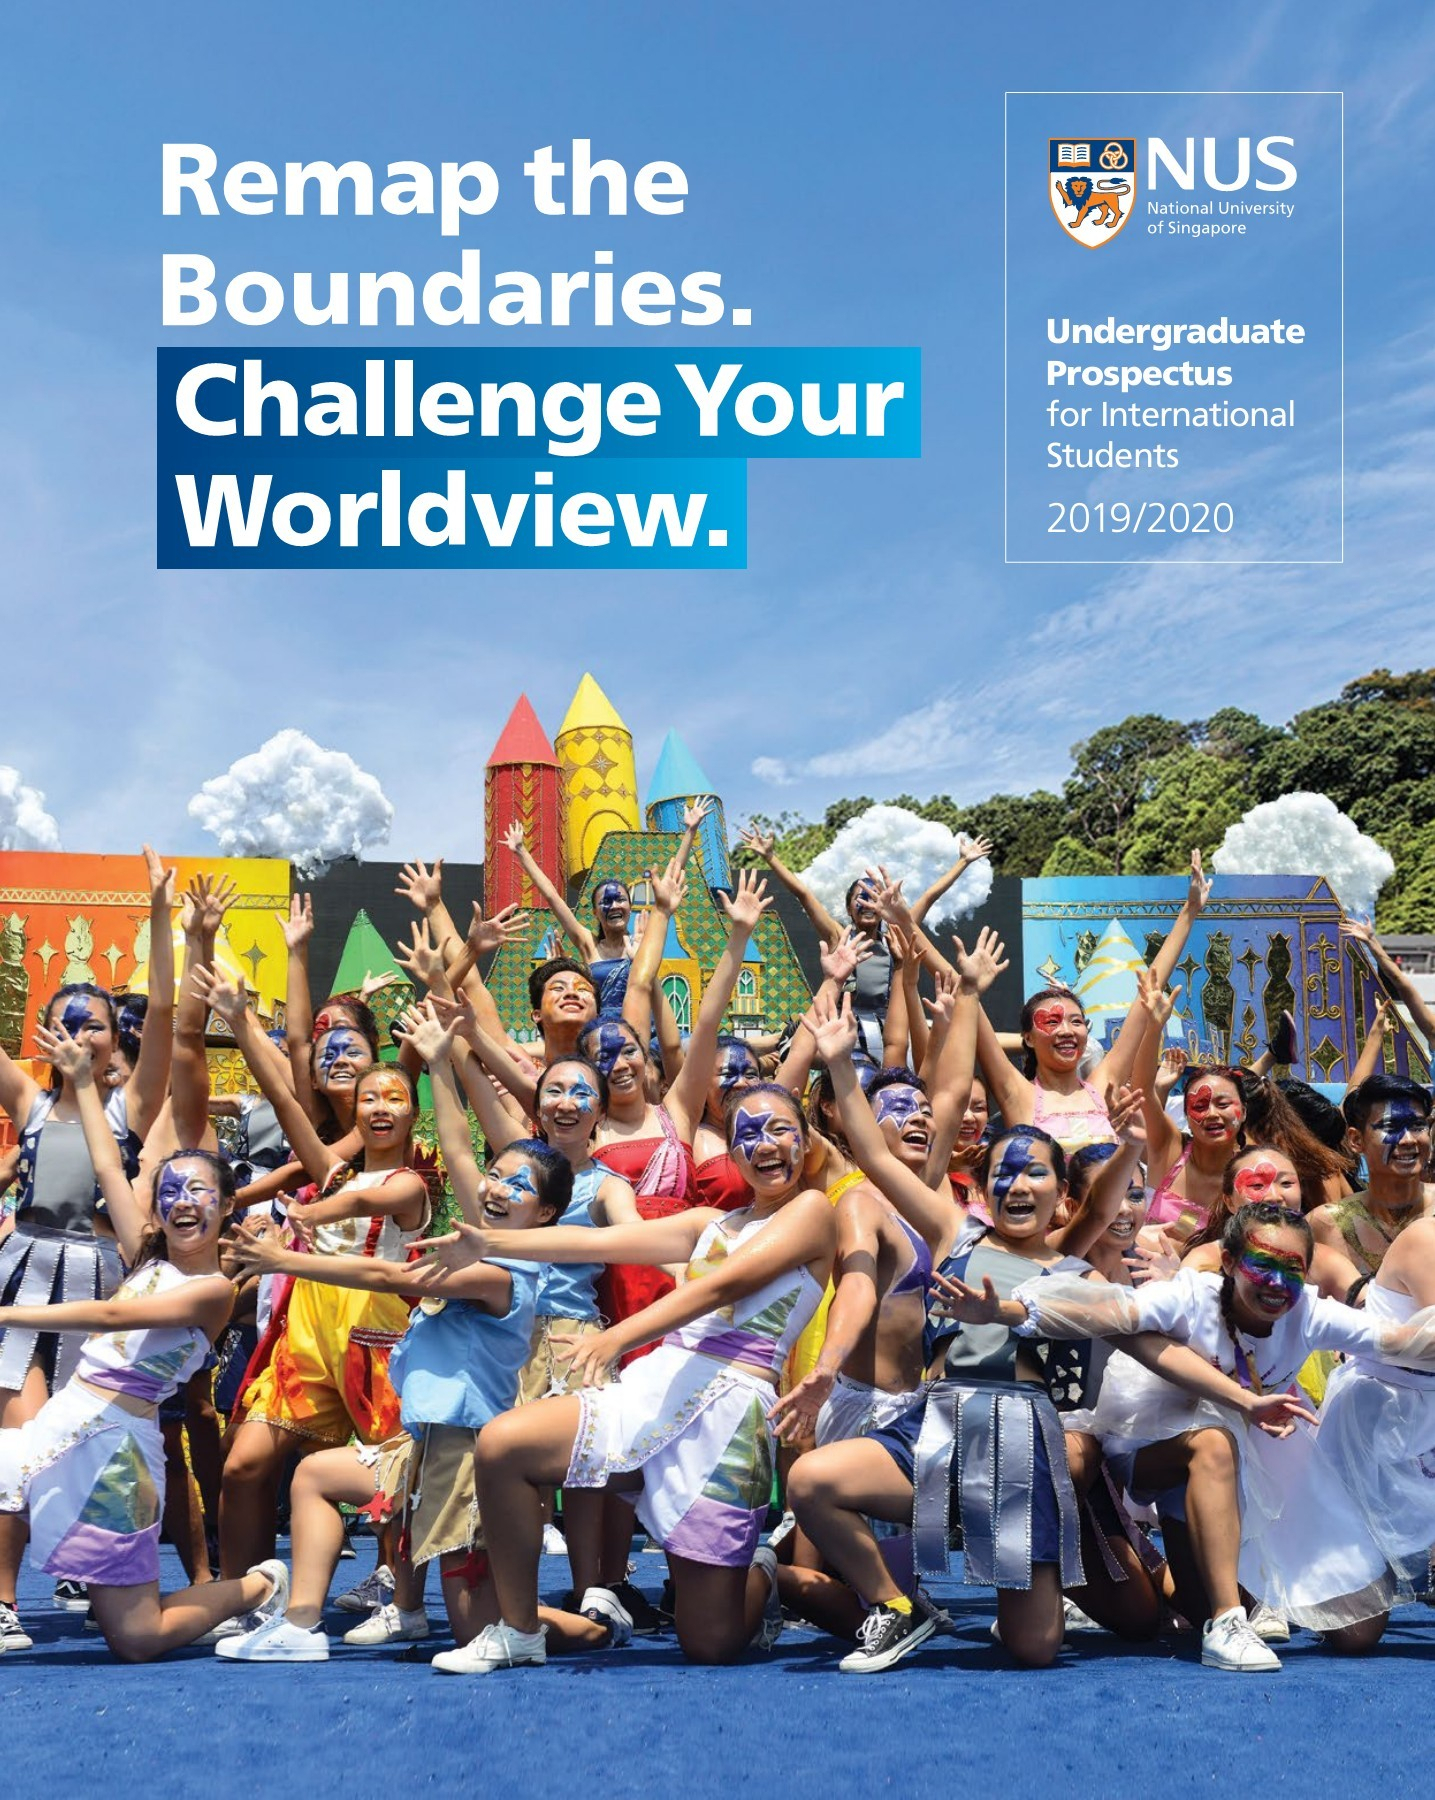 Ay2019/2020 Nus International Prospectus in Nus School Term 2019 2020